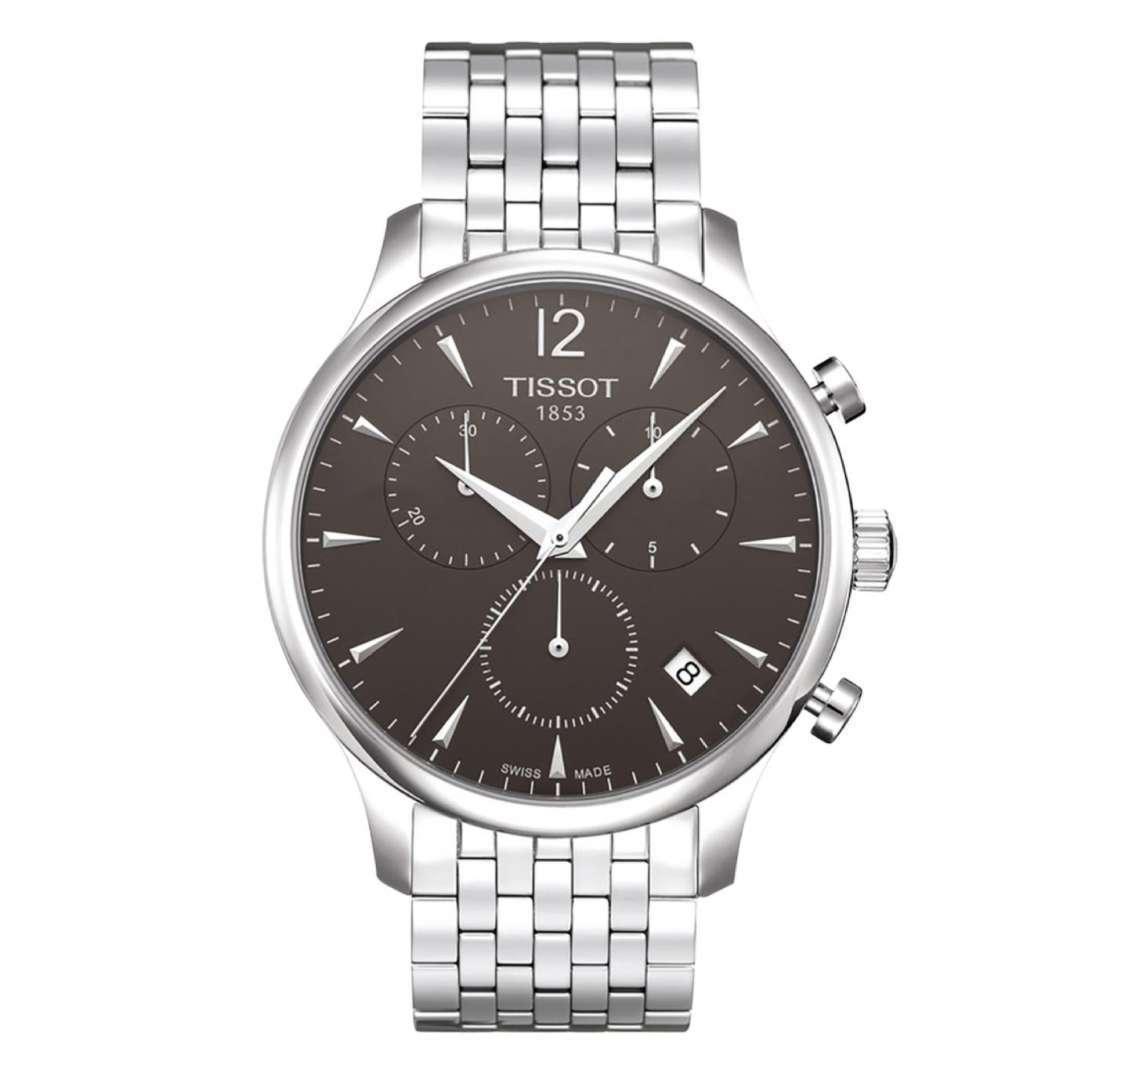 שעון יד אנלוגי tissot t063.617.11.067.00 טיסו